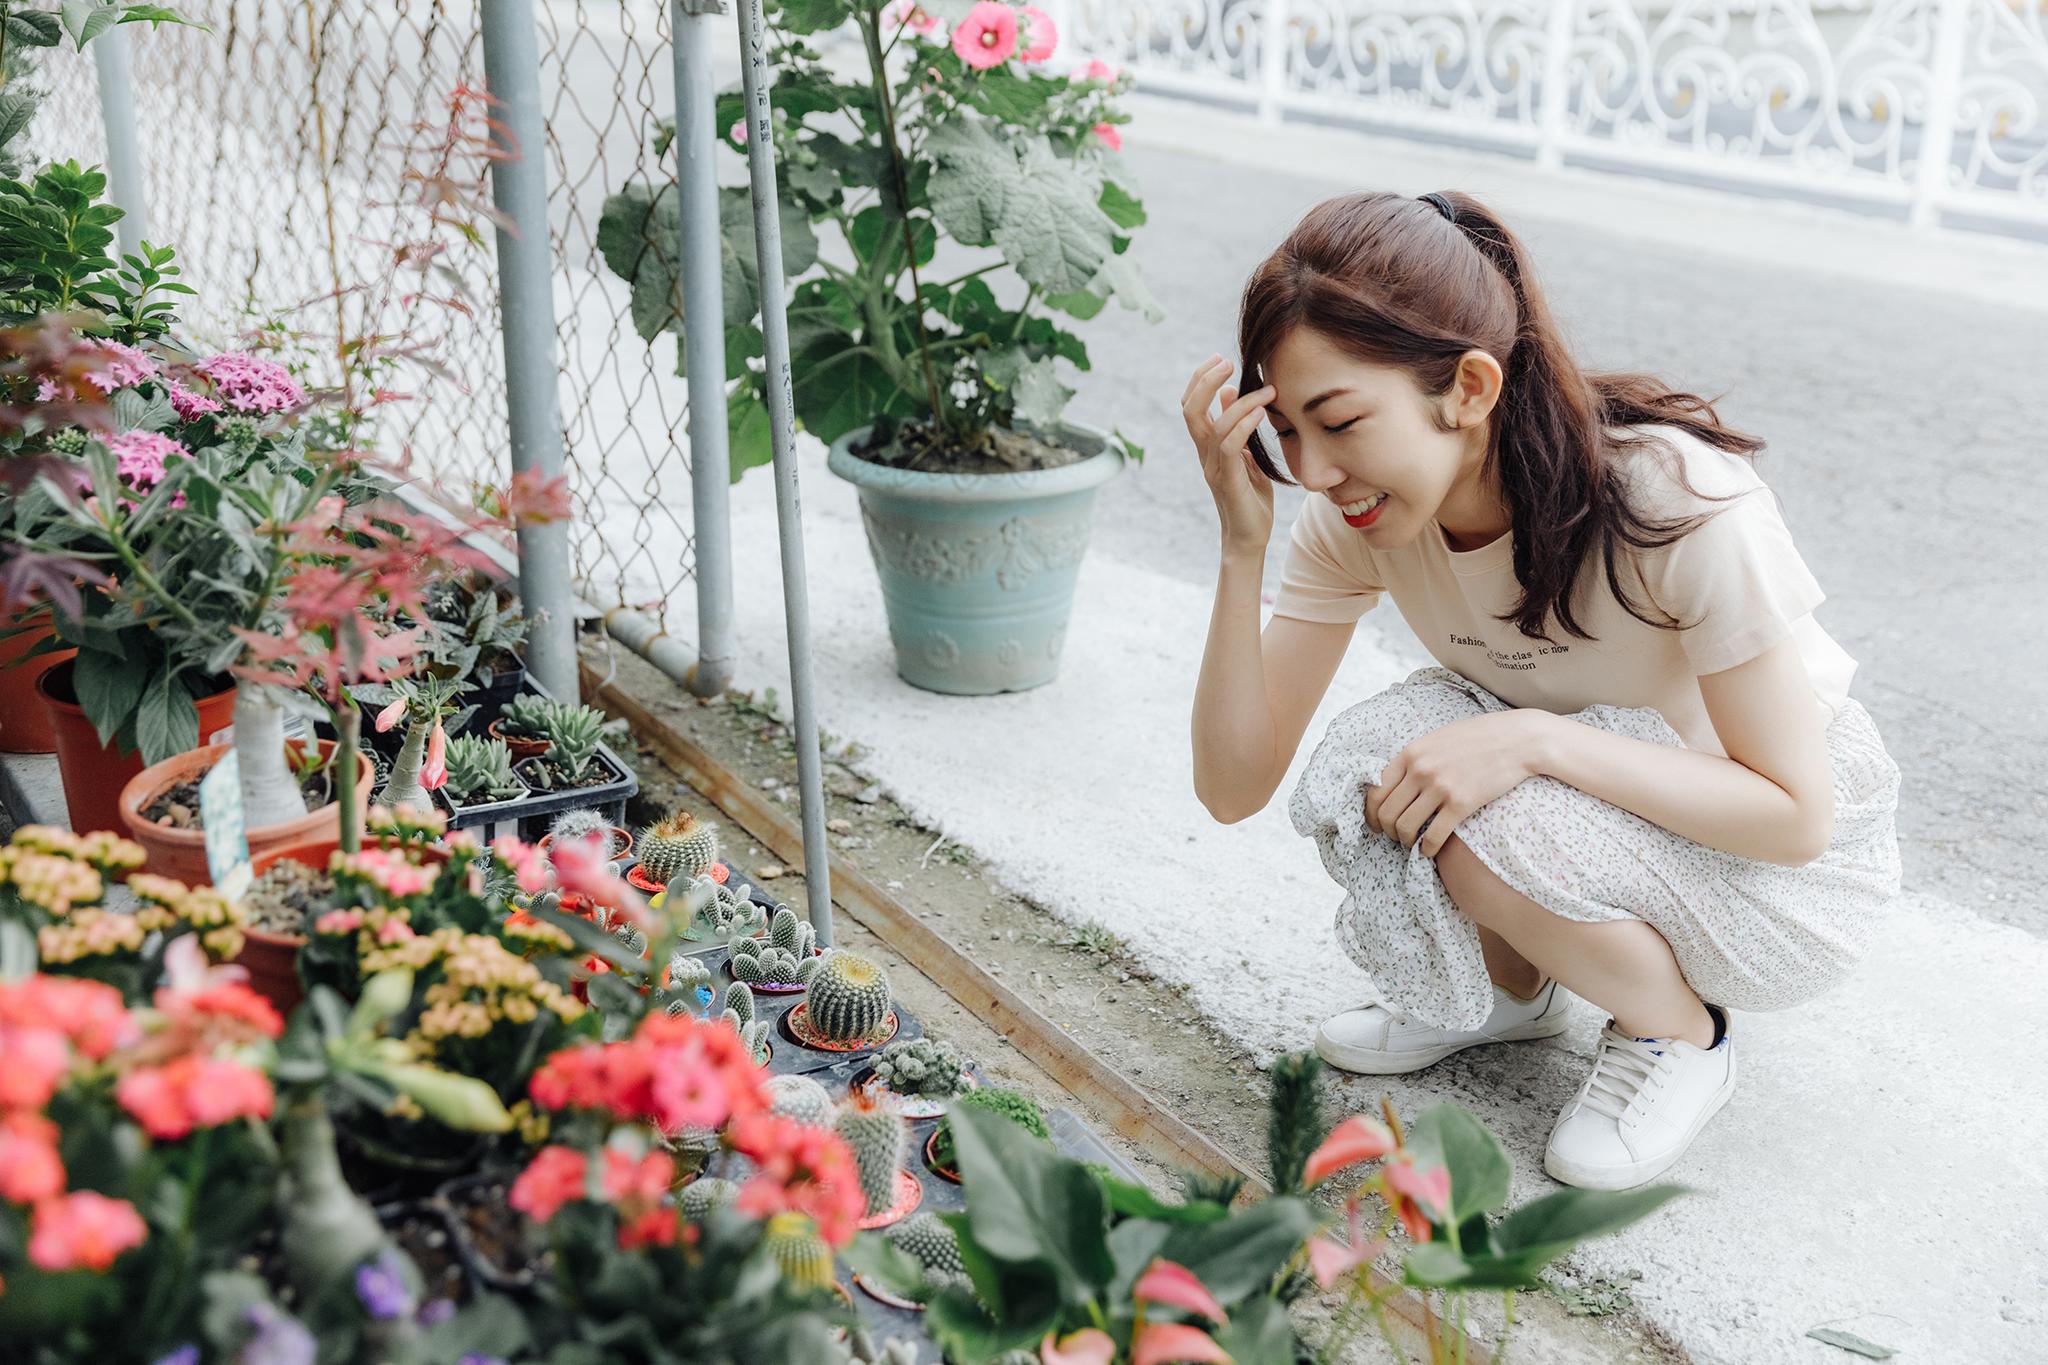 49785834091 cf7c5456a1 o - 【春季寫真】+Shan+